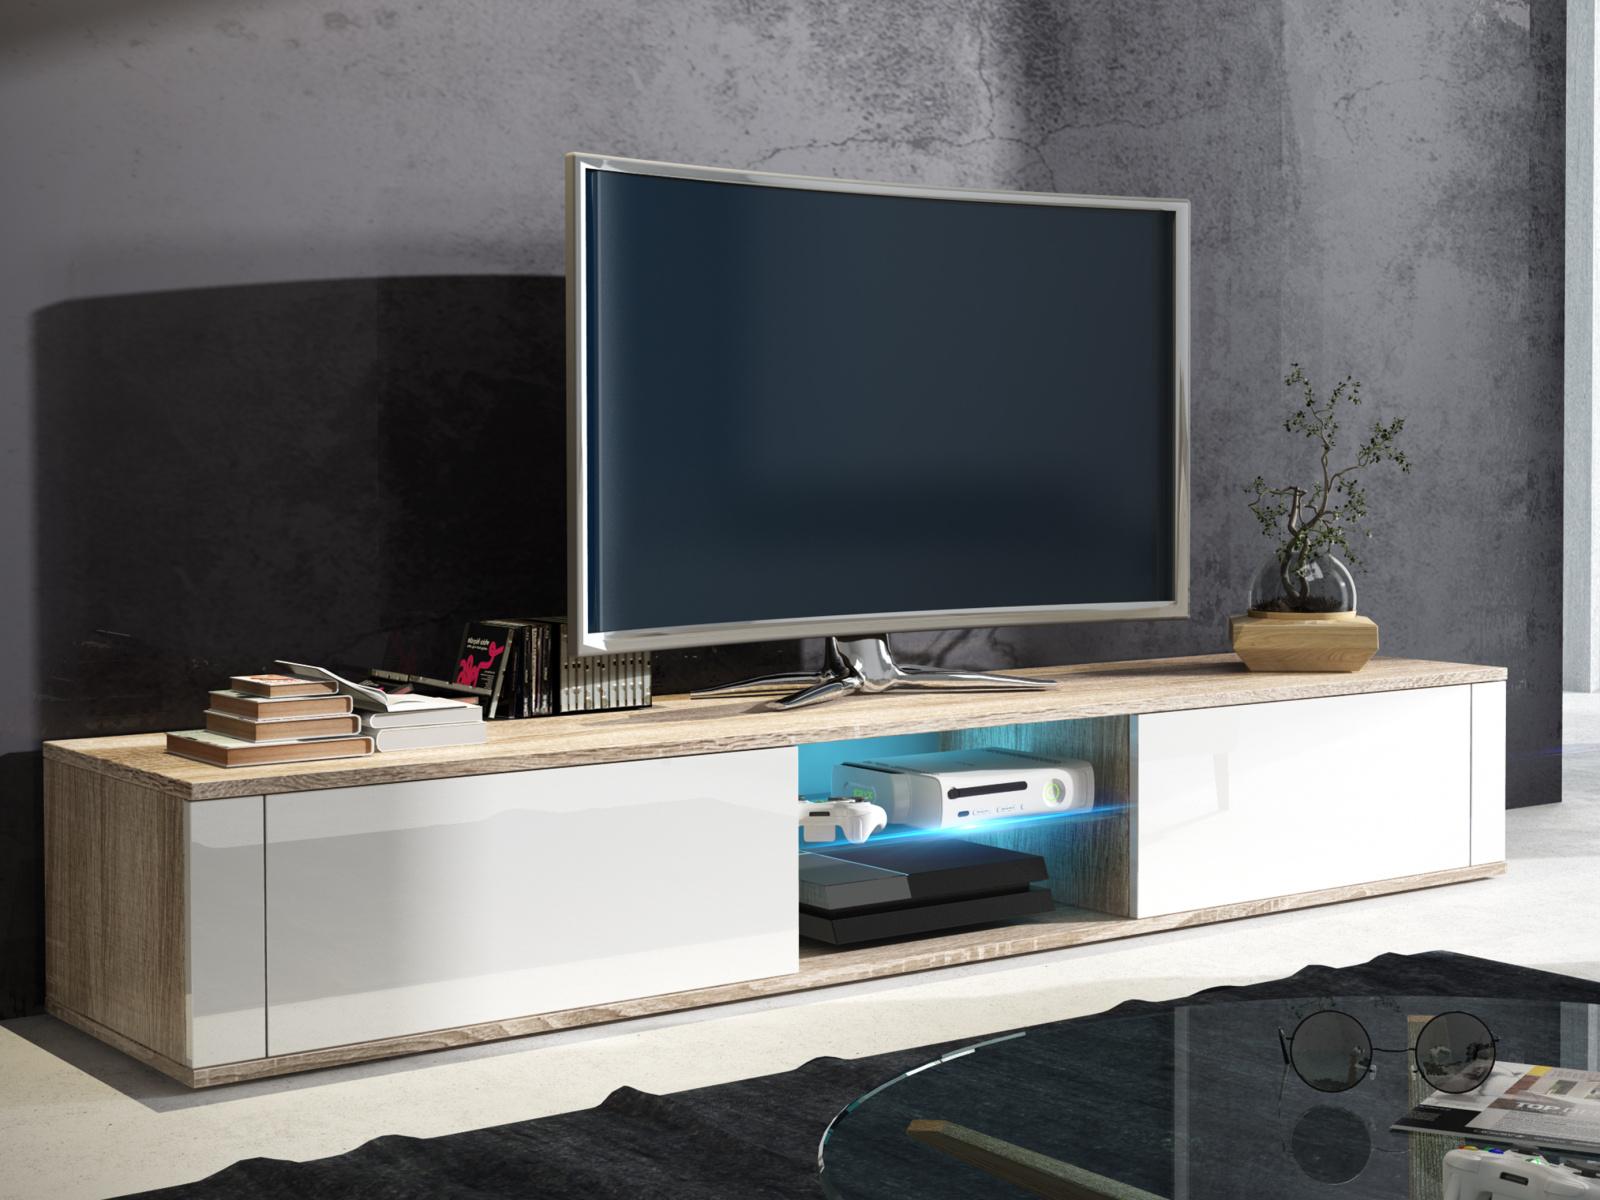 MORAVIA FLAT TV stolek HIT, dub sonoma/bílý lesk